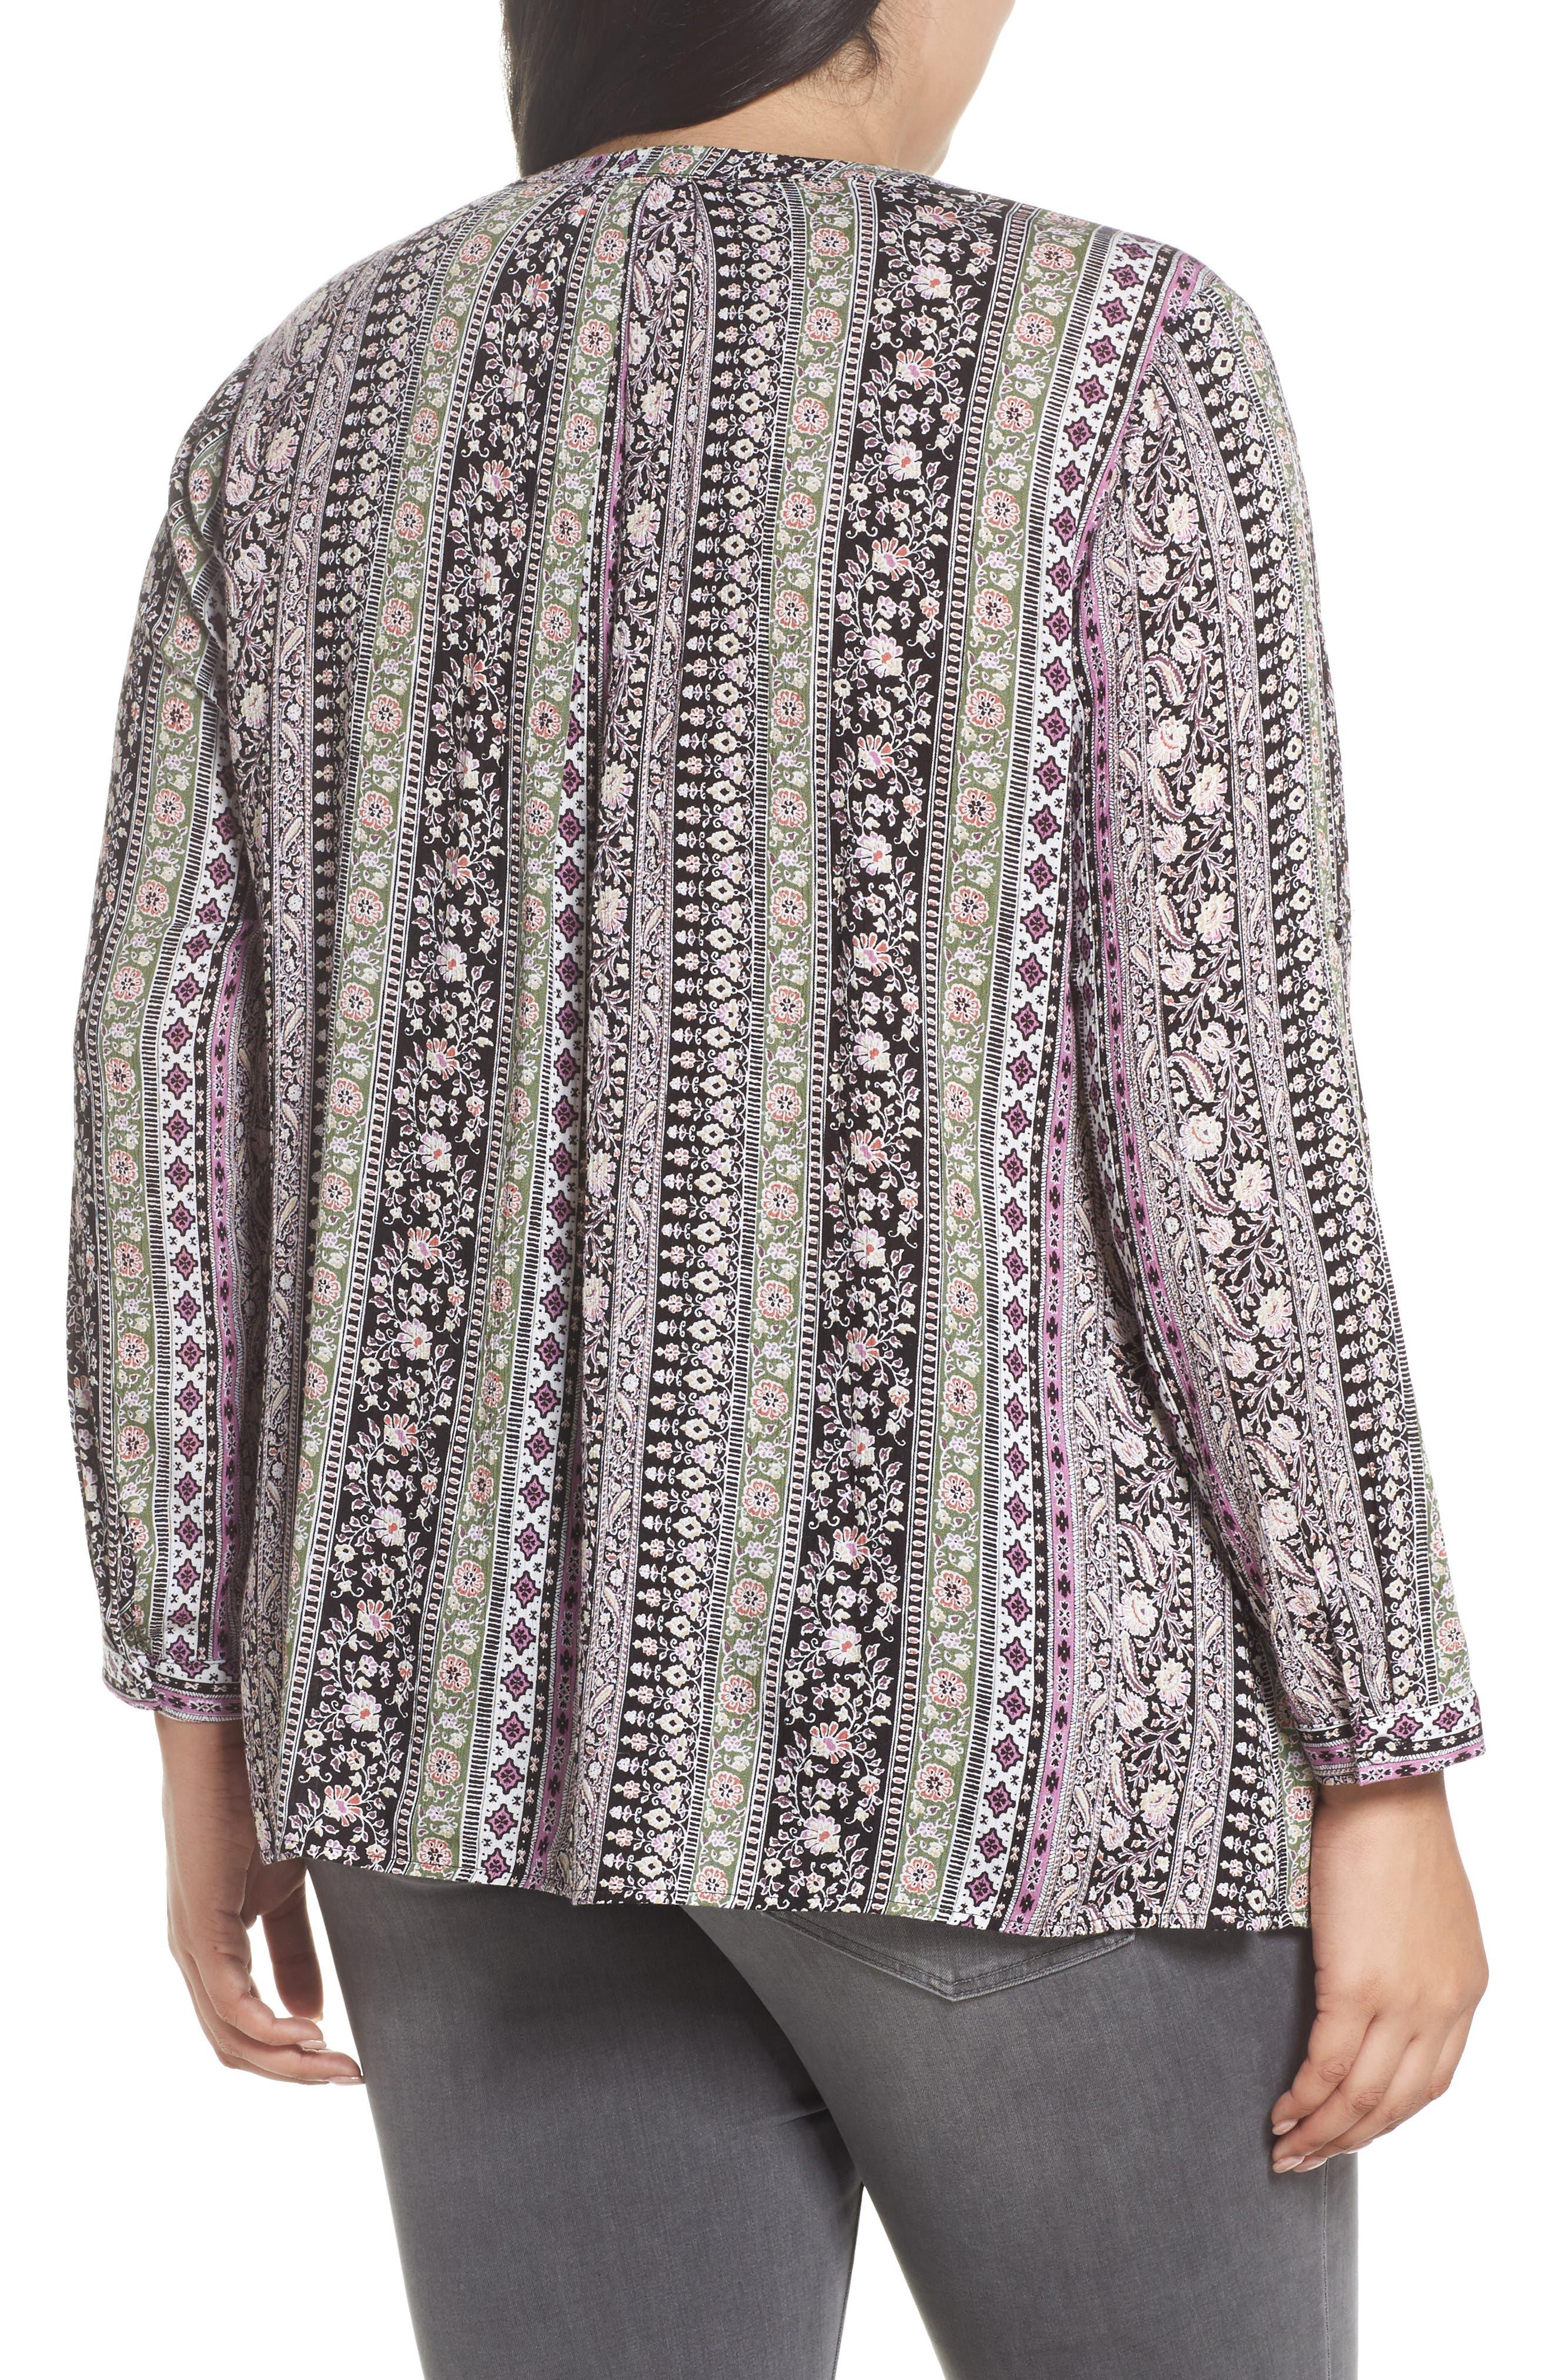 Alternate Image 2  - Daniel Rainn Embroidered Trim Floral Stripe Top (Plus Size)